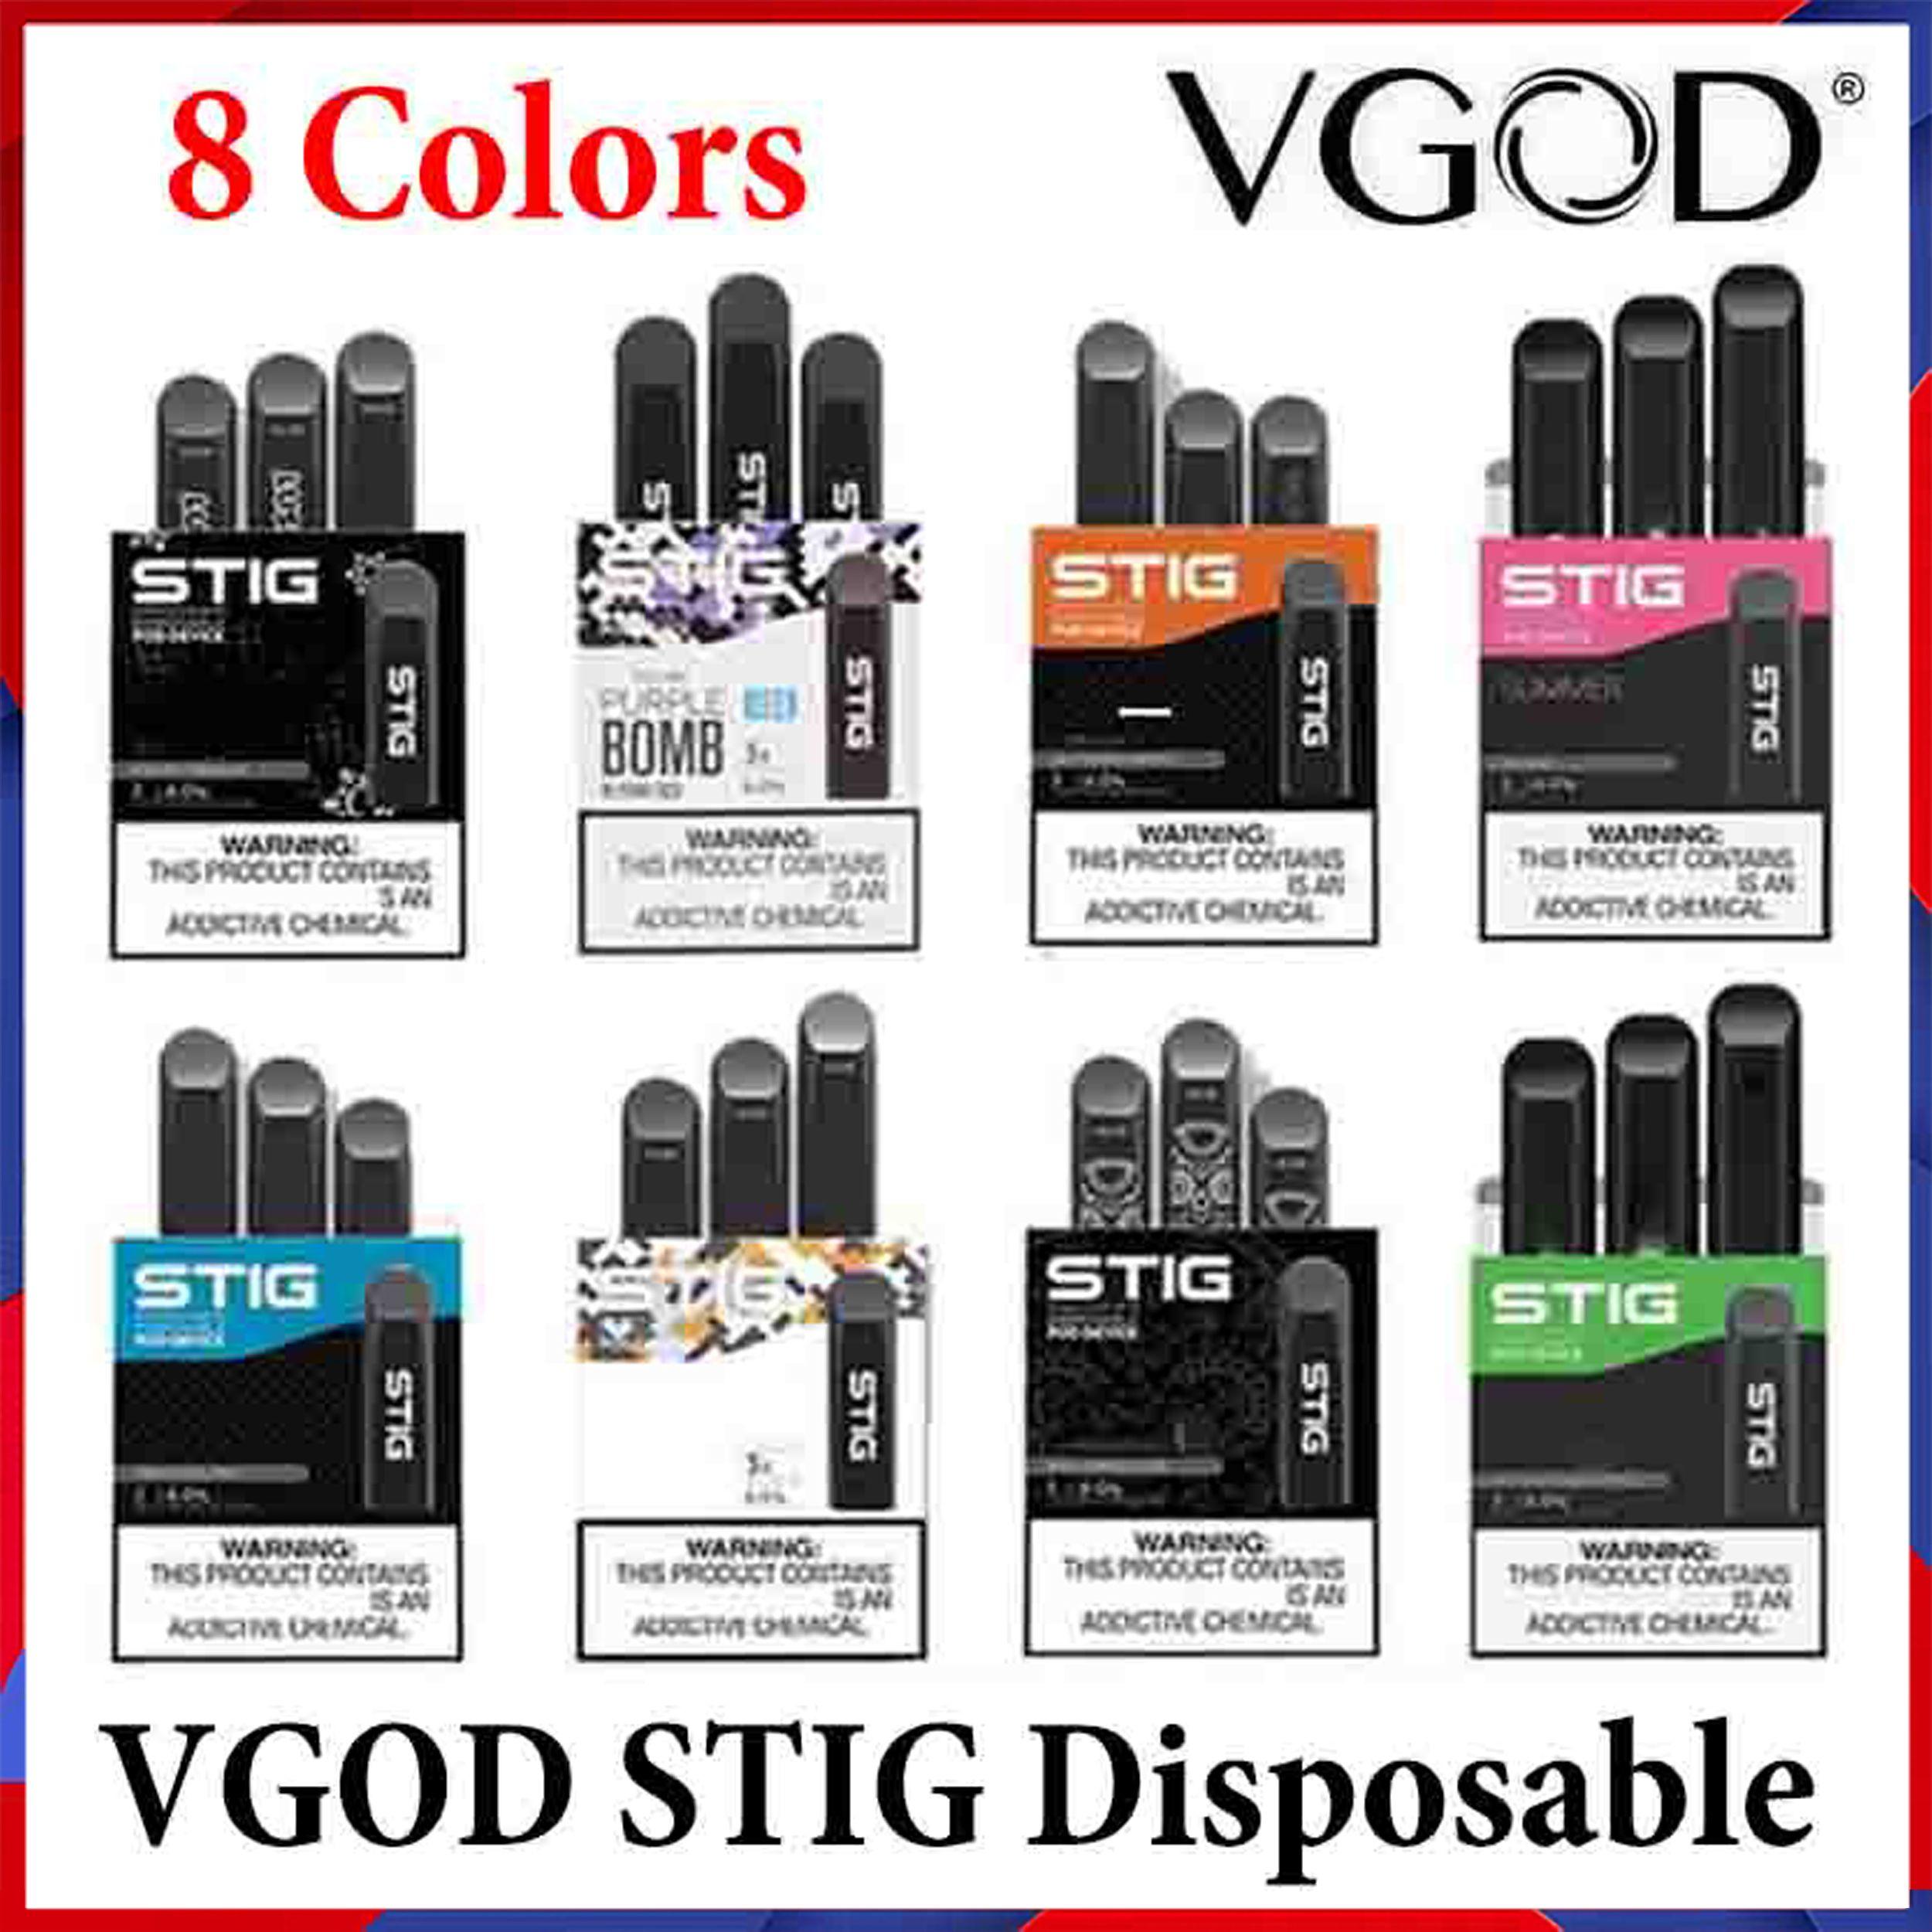 100% original VGOD Stig Descartável E Cigarro 8 Cores Pré-preenchido POD Dispositivo 3 PCS Pack 270mAh Bateria 1.2ml Cartucho Vape Pen Kit